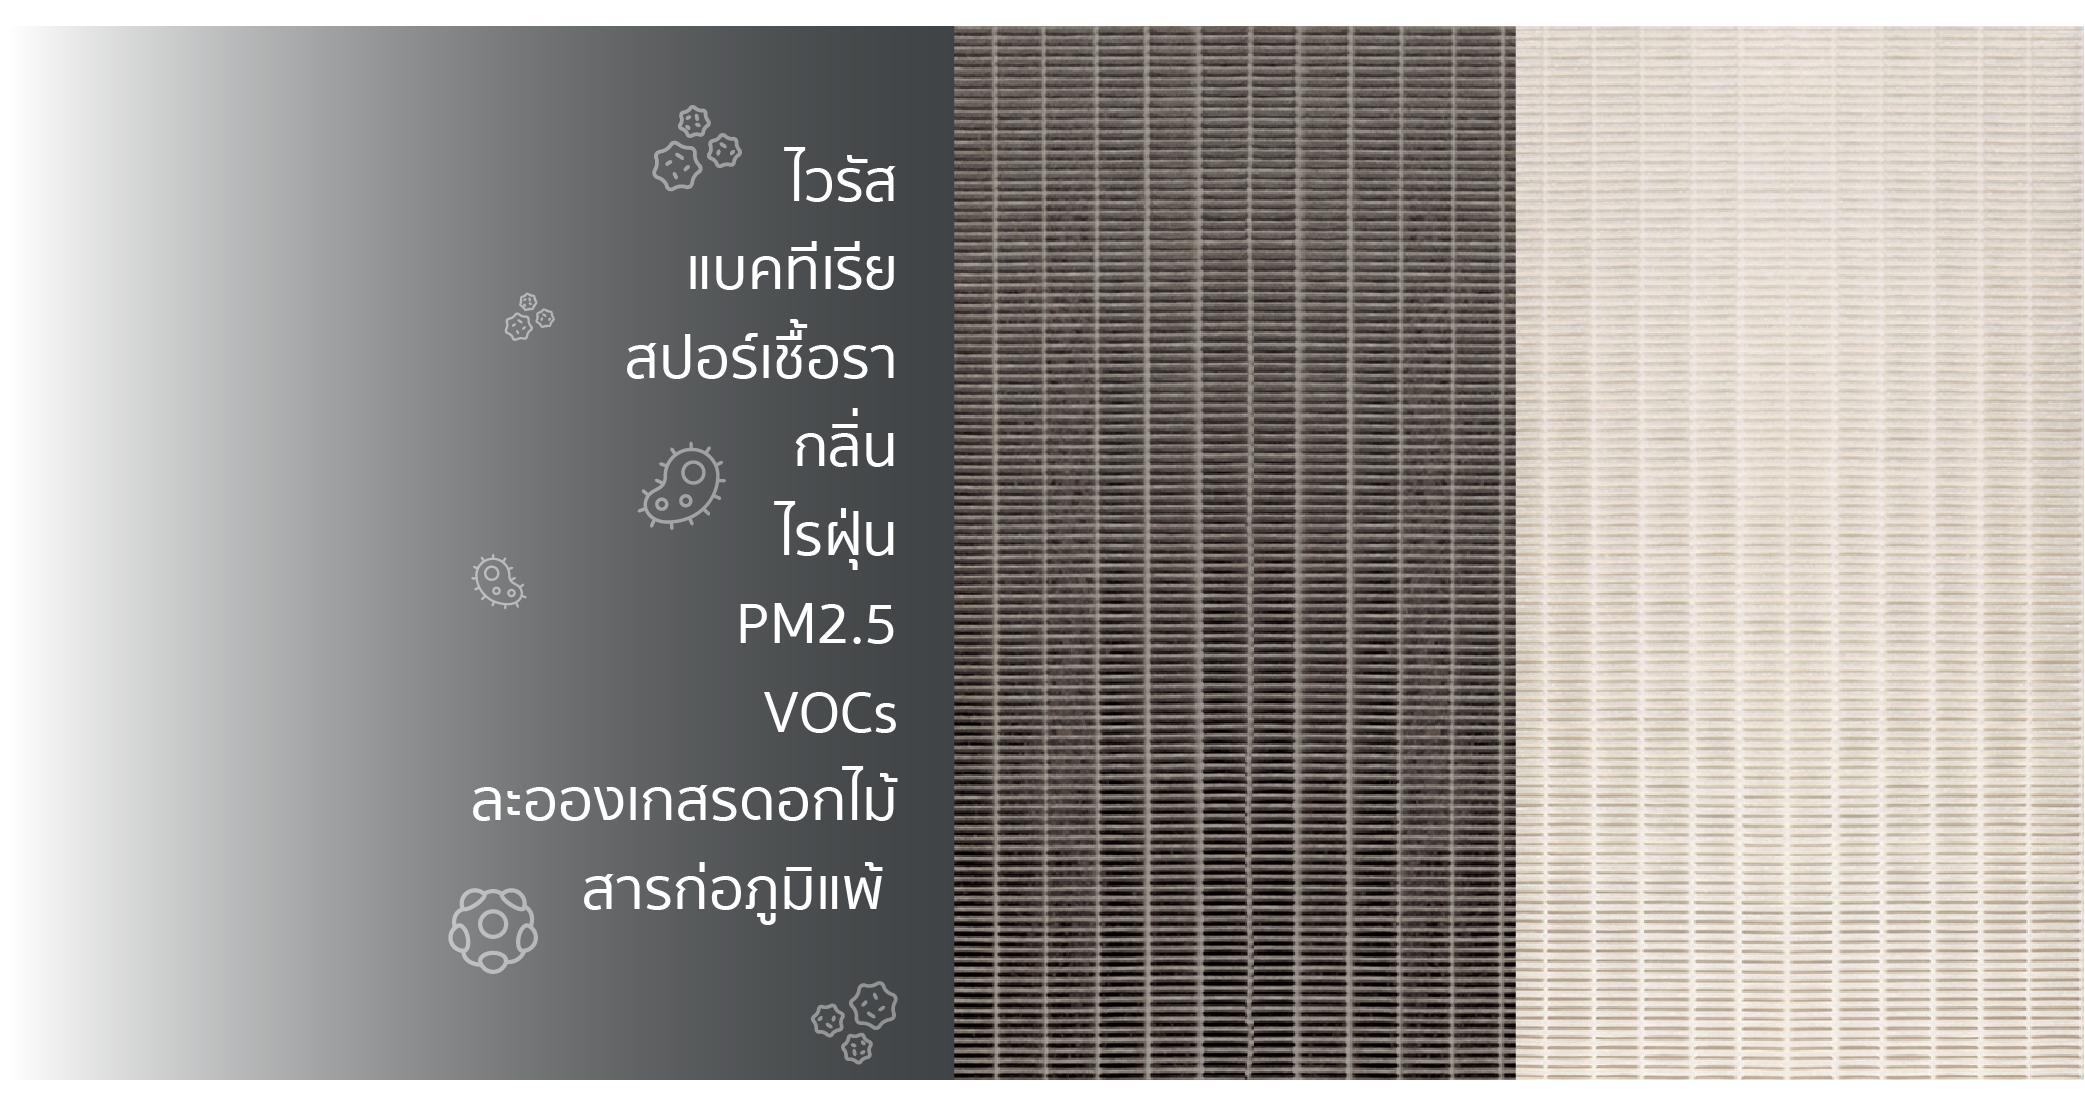 aug21-home1-06.png